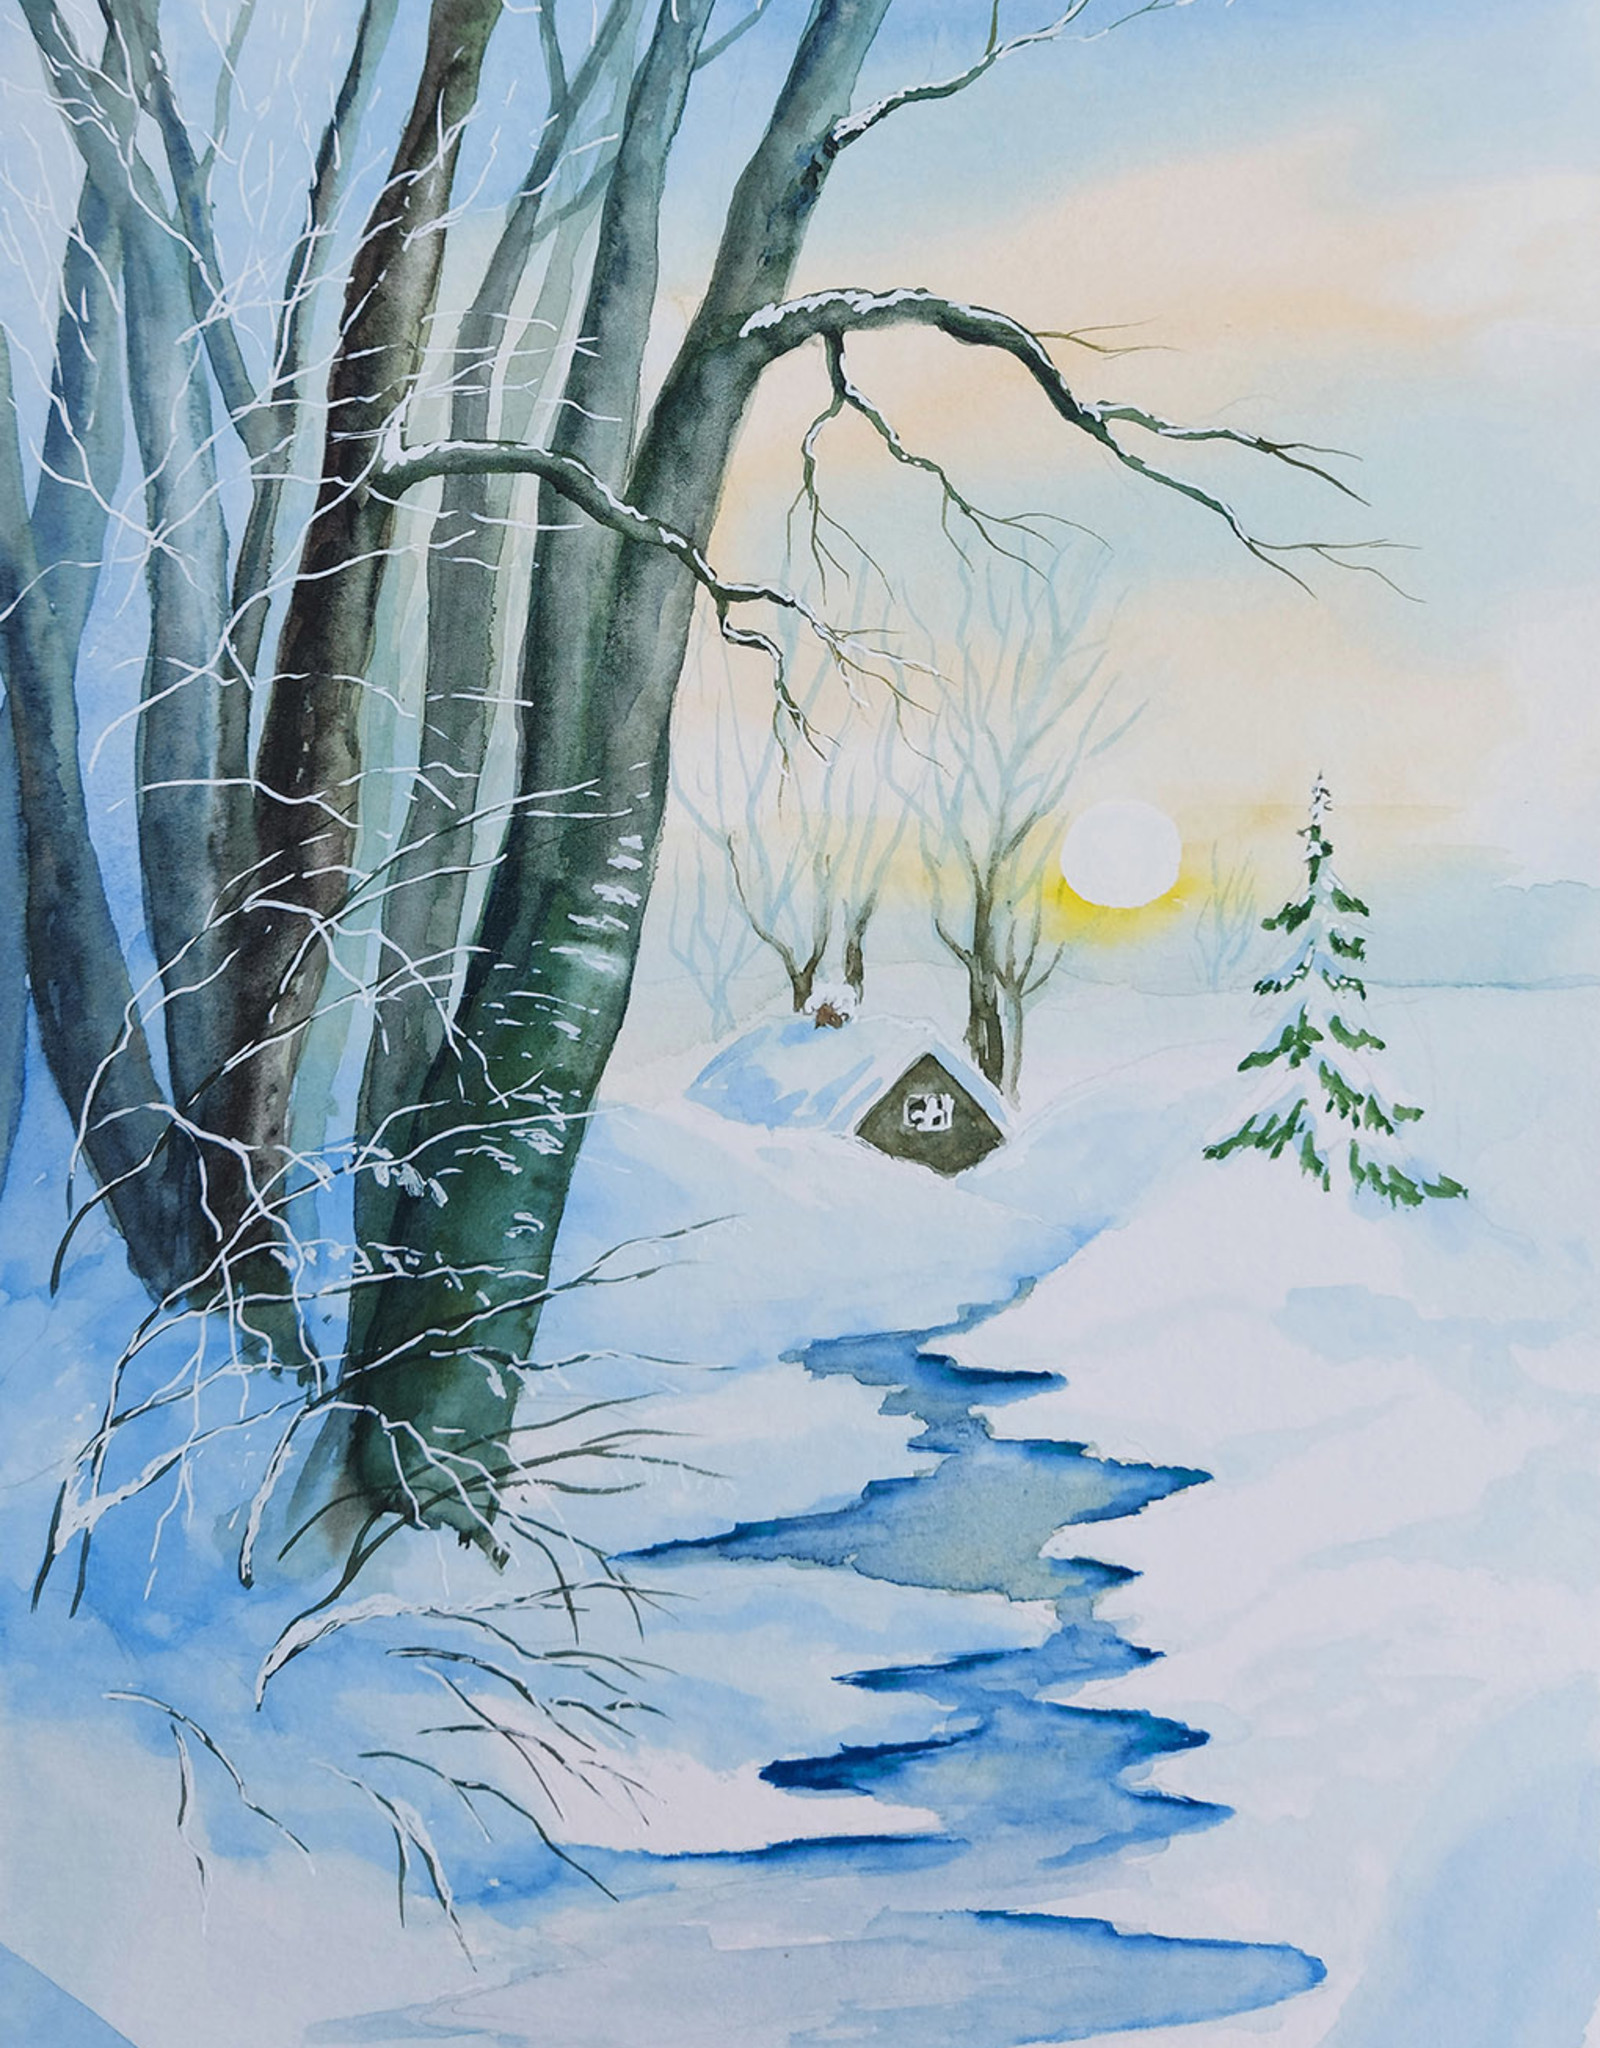 Tamara S Watercolour Art Class Snowy Winter Wed Nov 10 1:00 pm to 3:00 pm